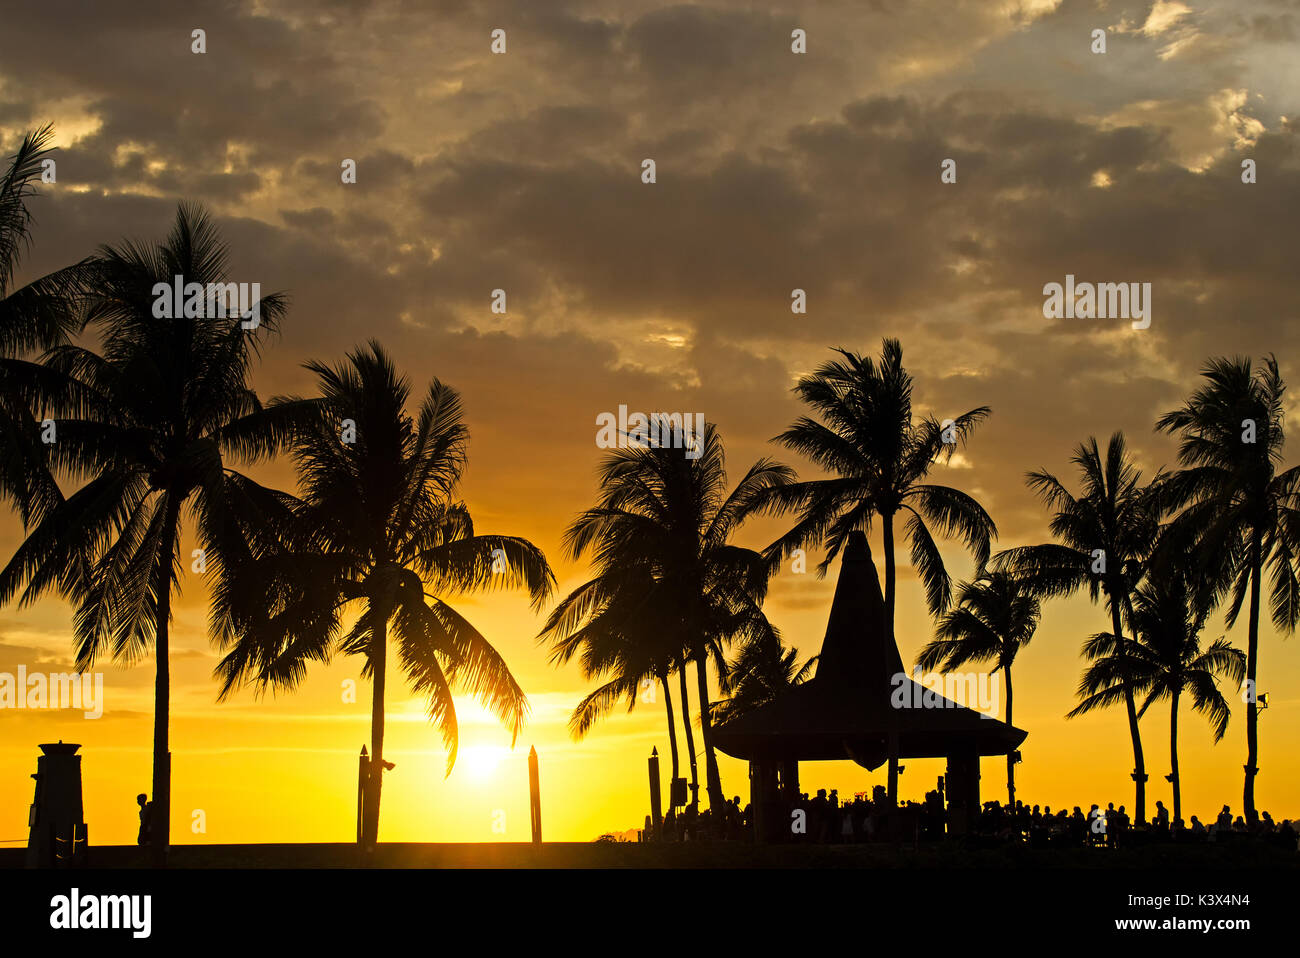 Silhouettes of palm tree during sunset in Kota Kinabalu, Sabah Borneo, Malaysia. - Stock Image